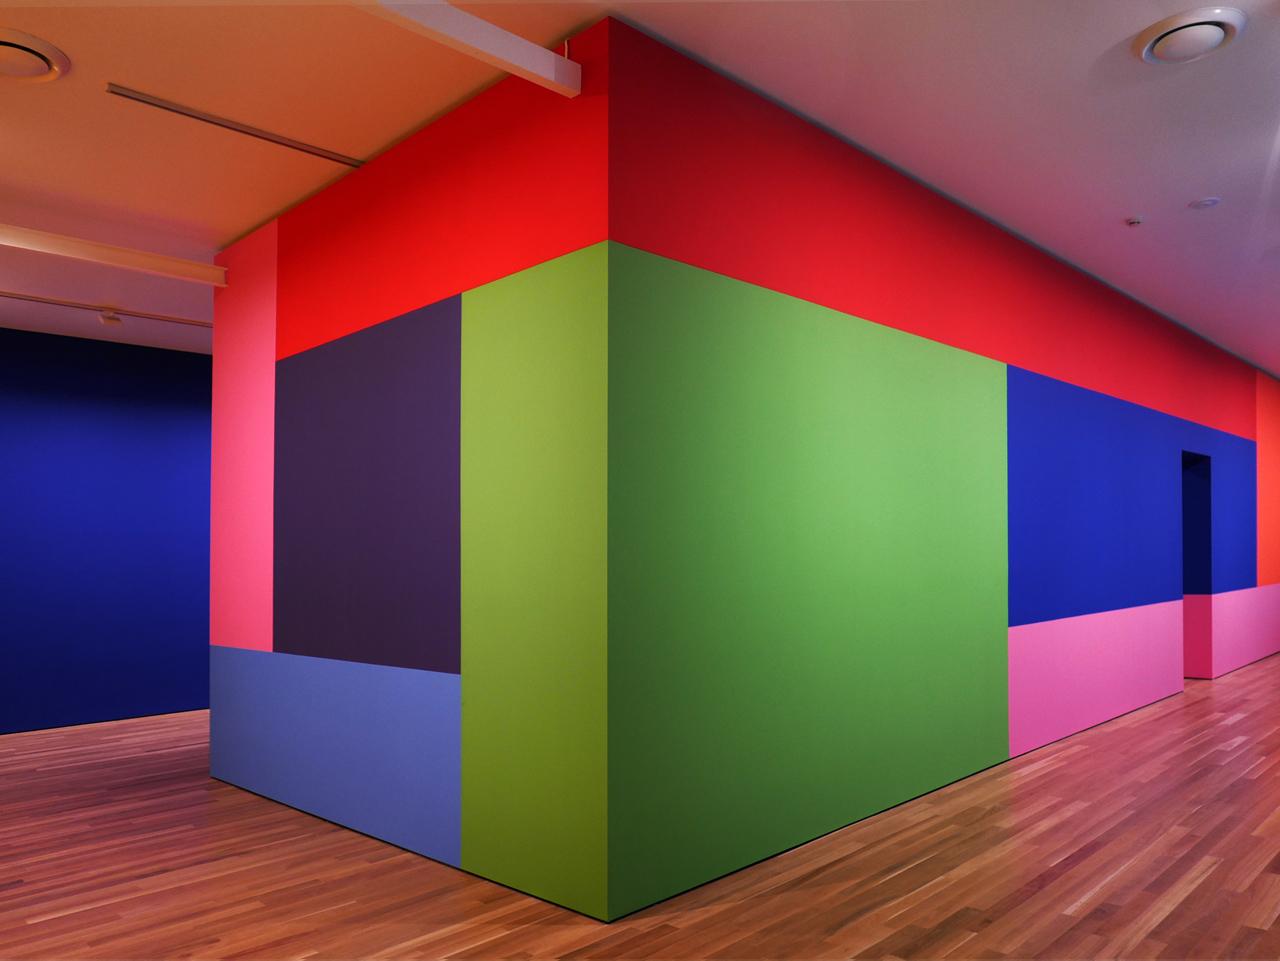 Robert Owen Afterglow Latrobe Reginal Gallery Install 9_LR.jpg